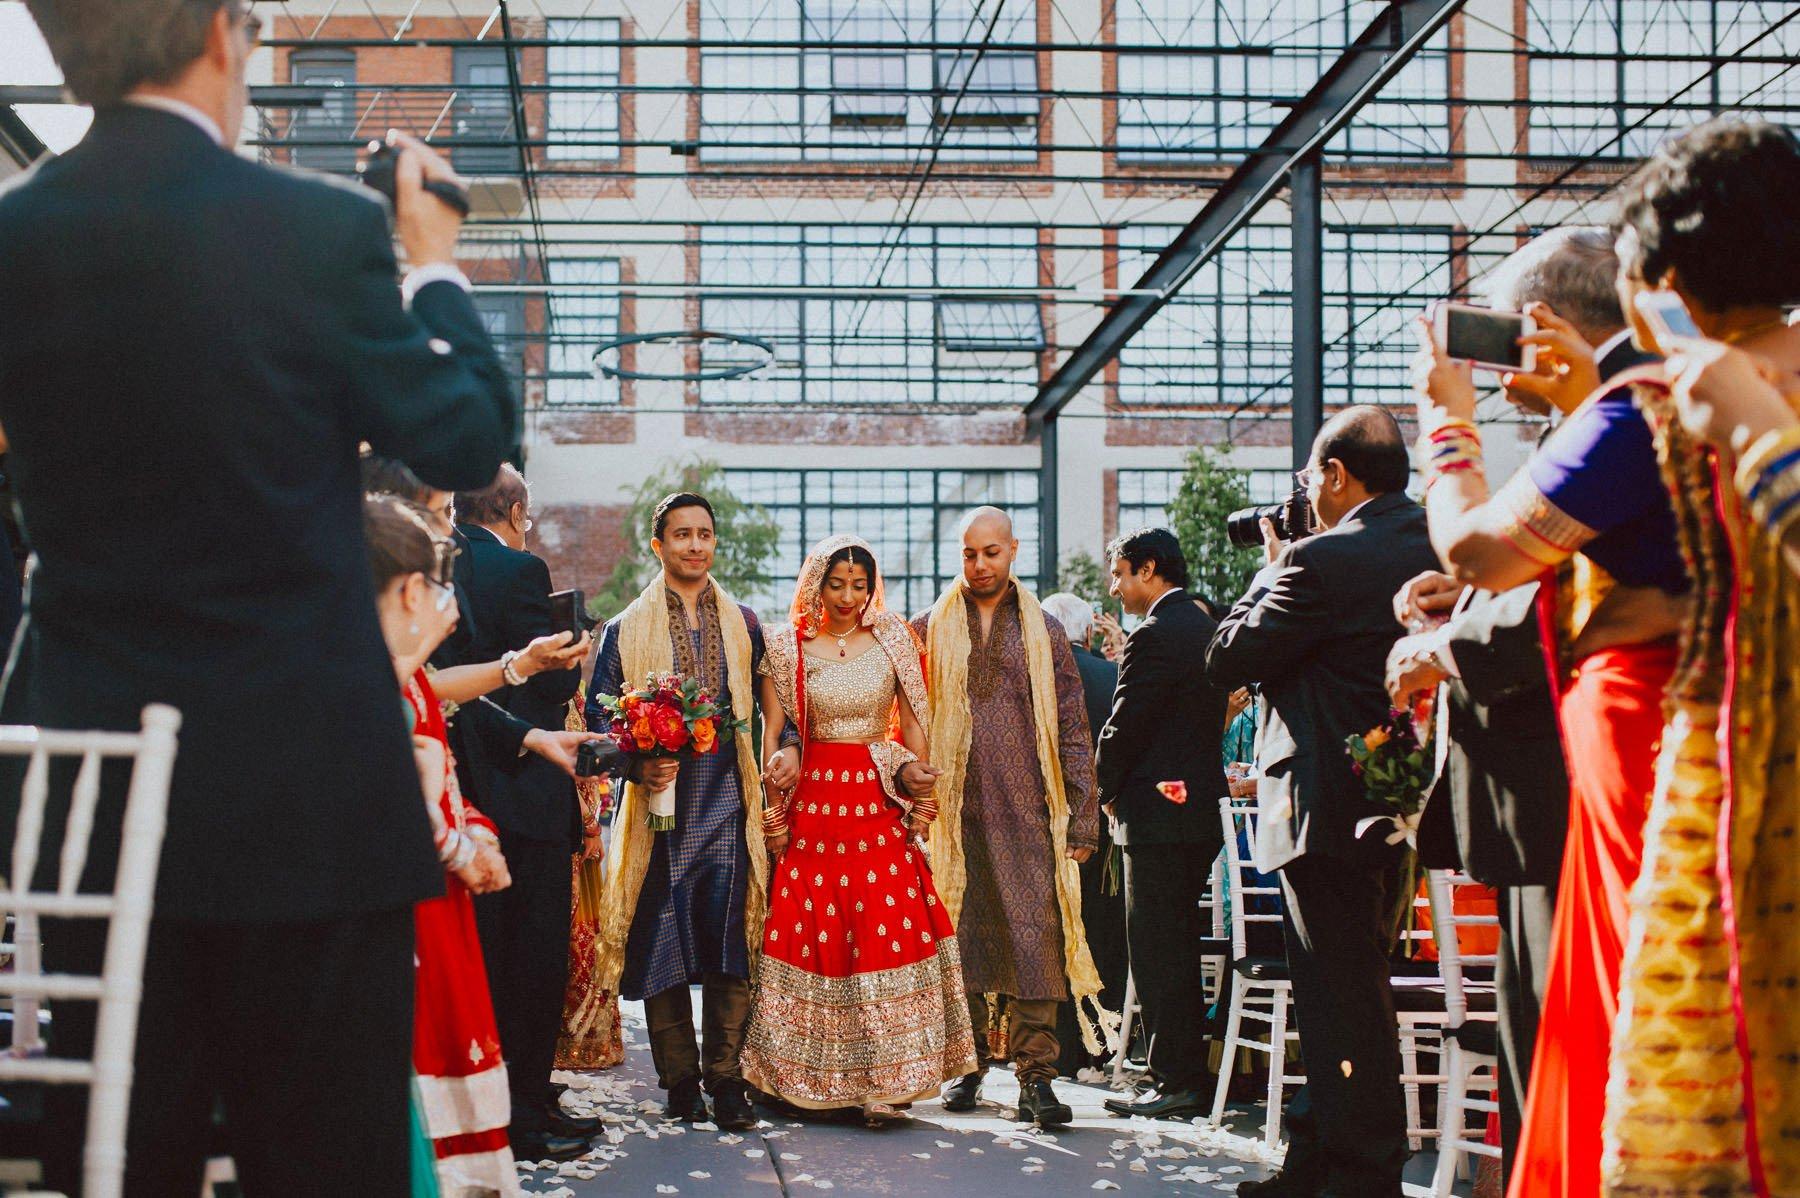 vie-philadelphia-indian-wedding-74.jpg